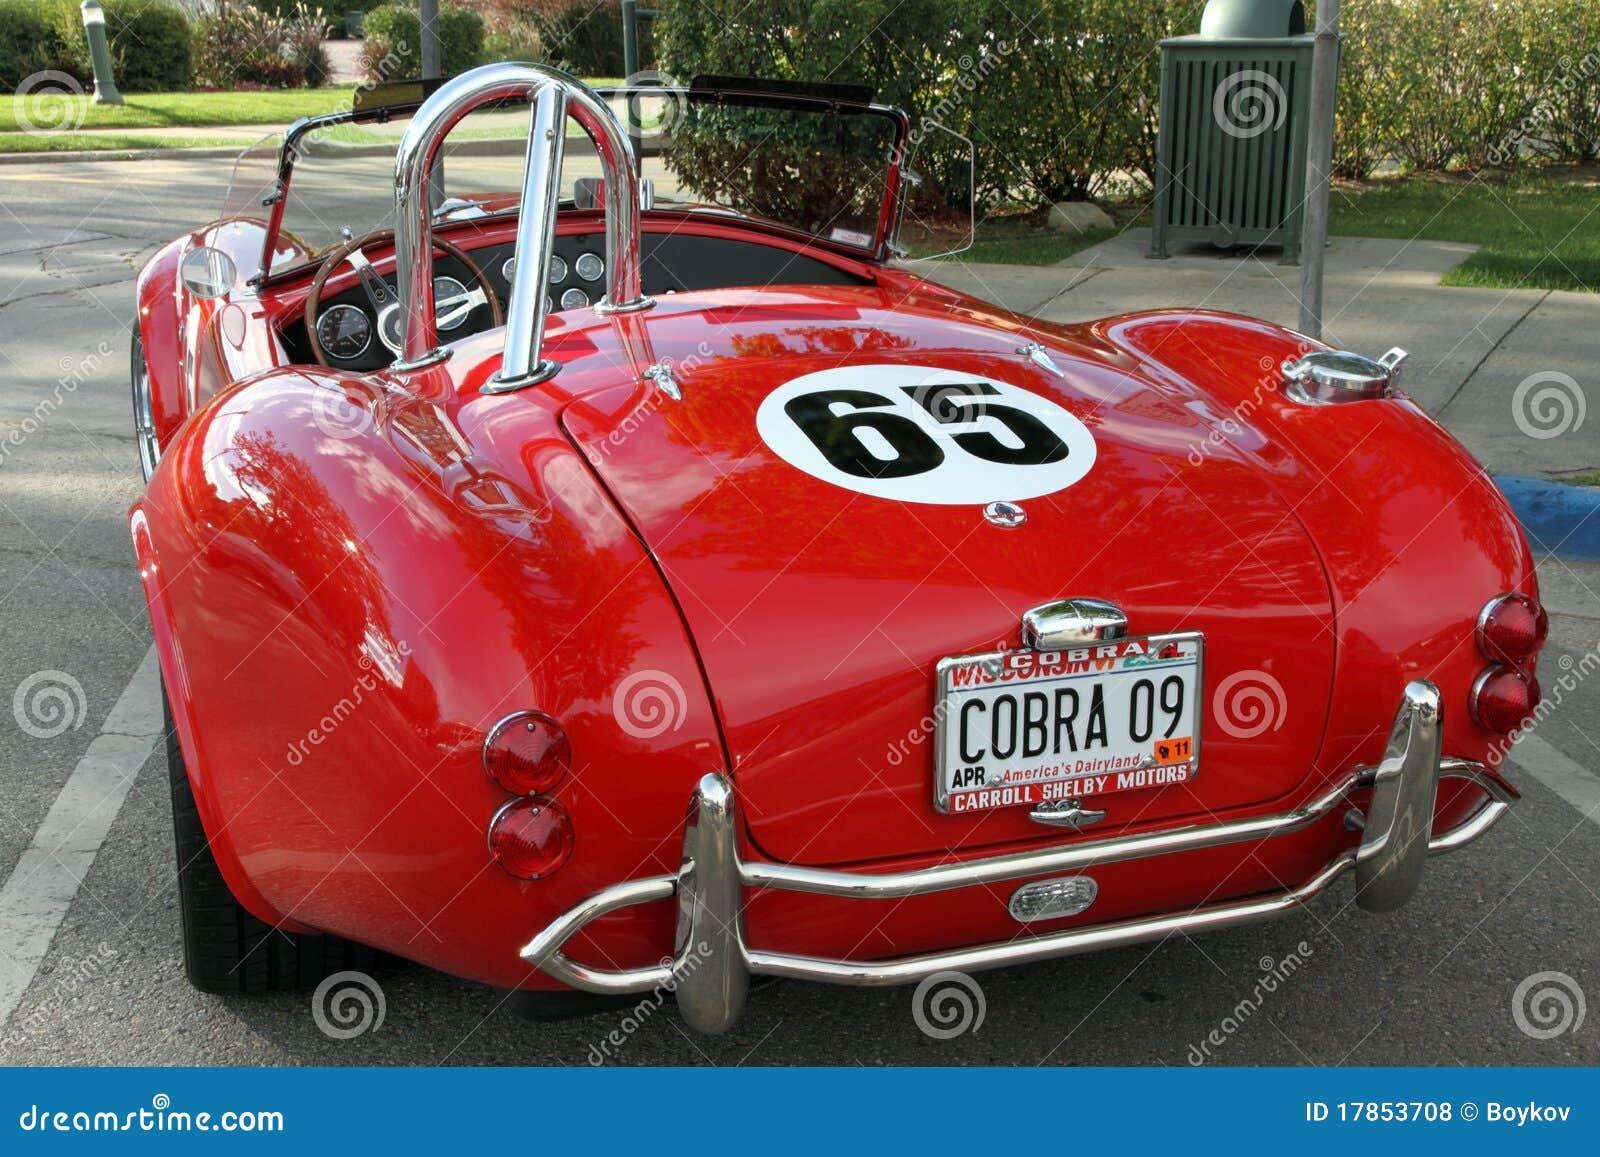 a retro sports car cobra editorial stock photo image of hood 17853708. Black Bedroom Furniture Sets. Home Design Ideas